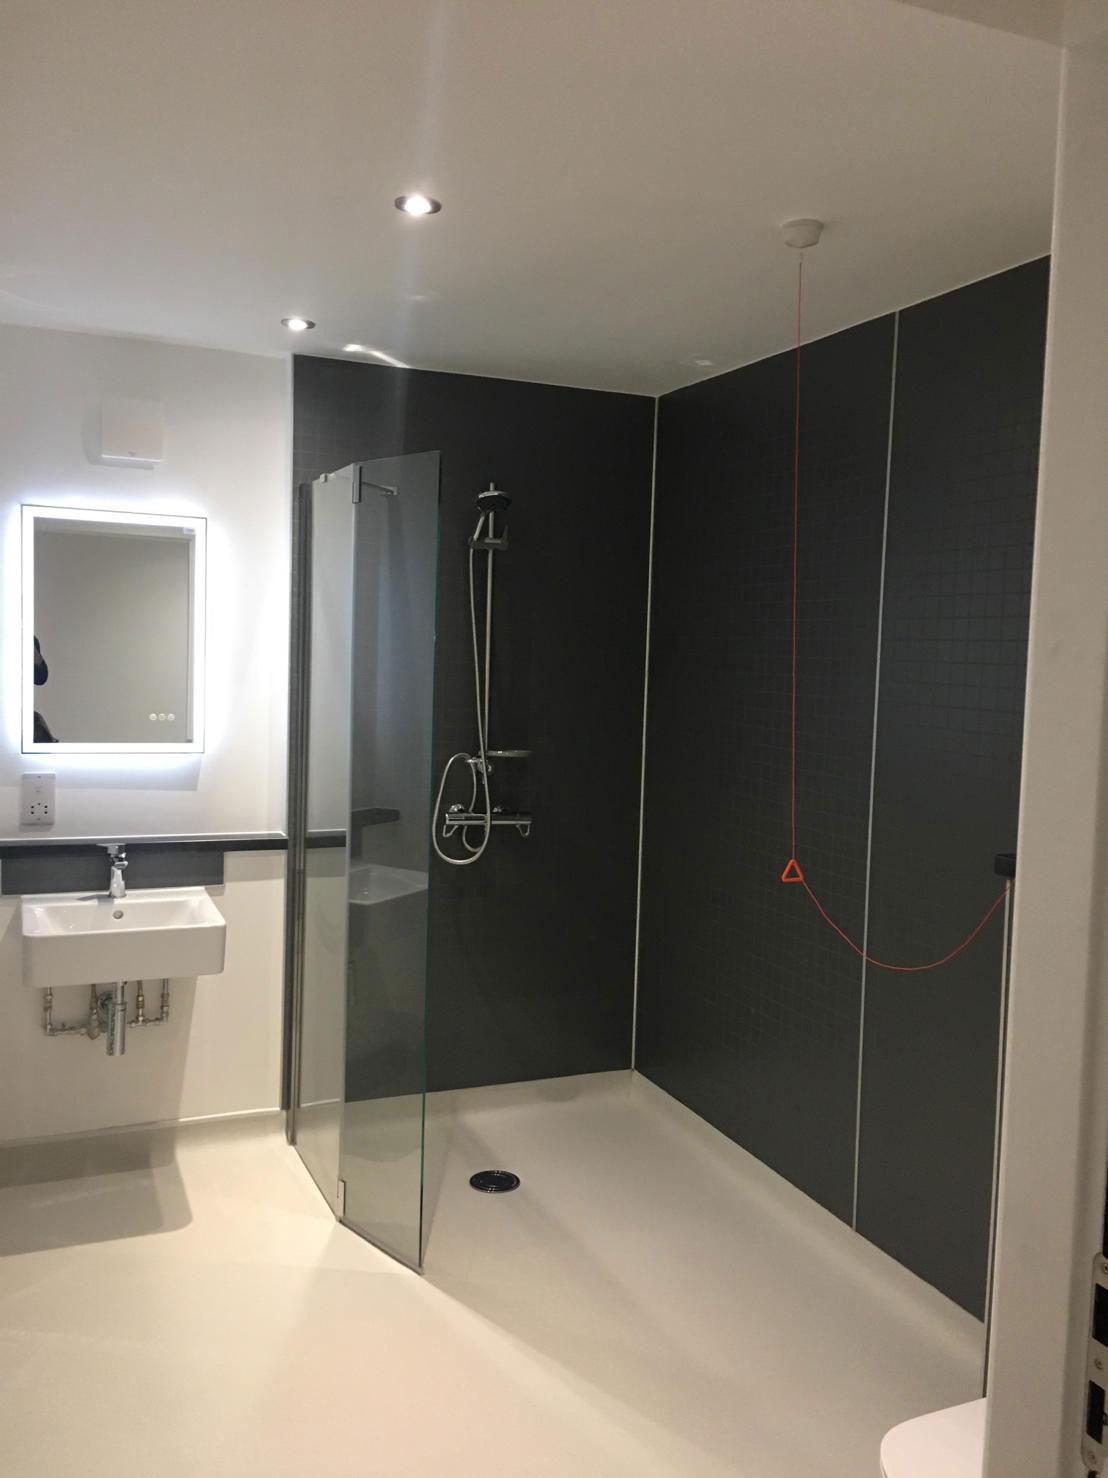 Housing 21 Retirement living modular apartments UK - Richard Onslow Court - Internal bathroom